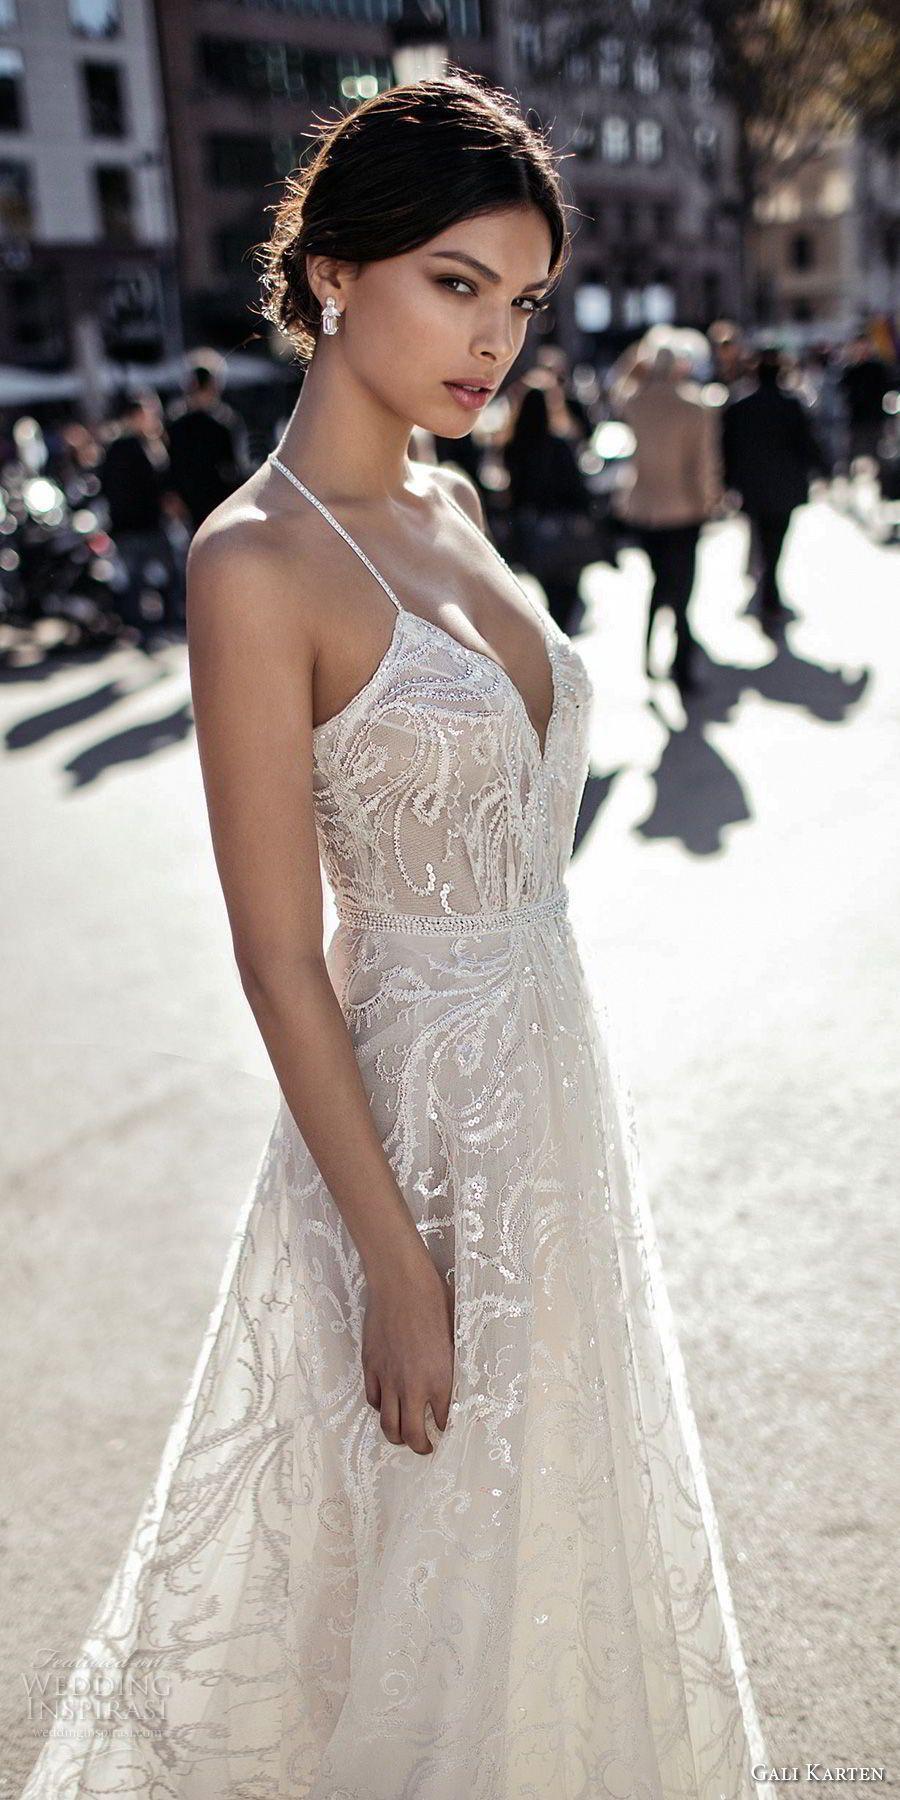 b66462fa4c8 gali karten 2017 bridal spaghetti strap halter neck deep sweetheart  neckline full embellishment elegant romantic soft